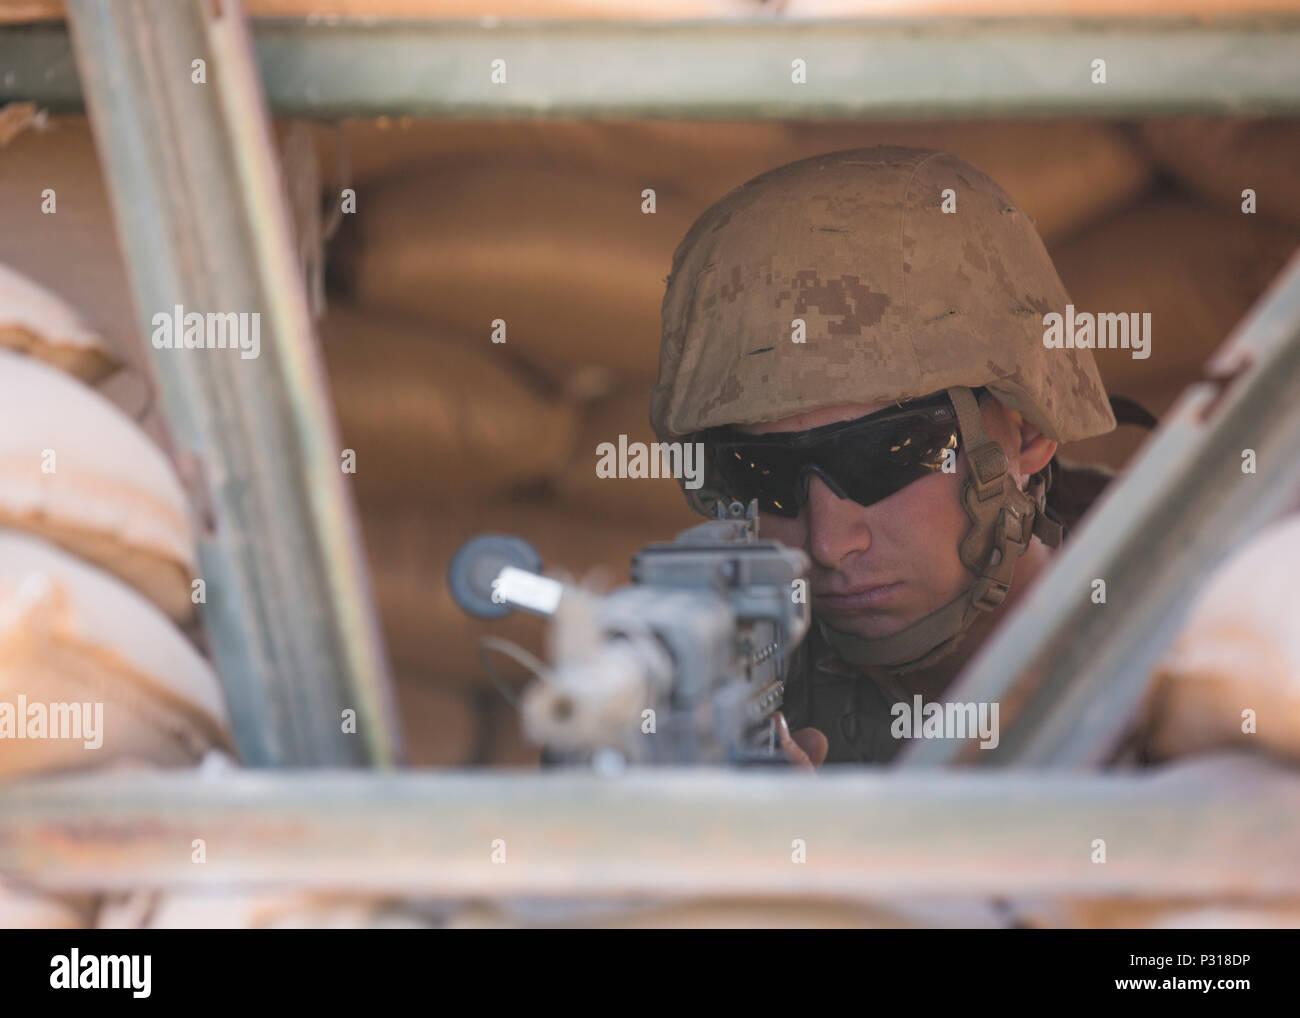 I Mef Lse 16 Stock Photos & I Mef Lse 16 Stock Images - Alamy